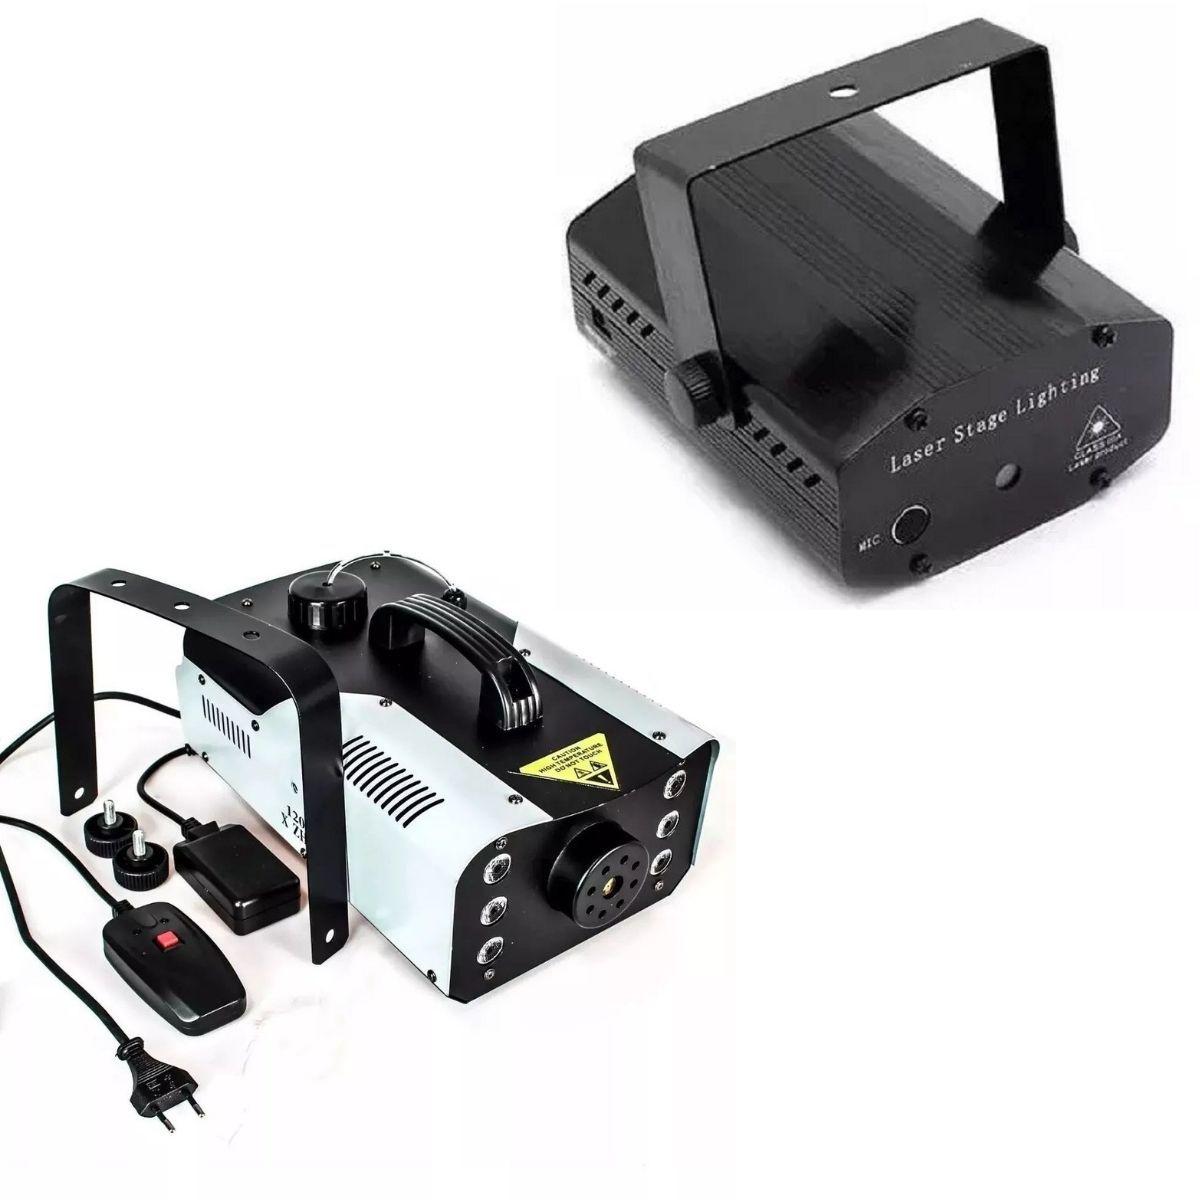 Kit Luz E Festa Profissional Com 2 Mini Laser Holográfico + 2 Maquina De Fumaça 1200W